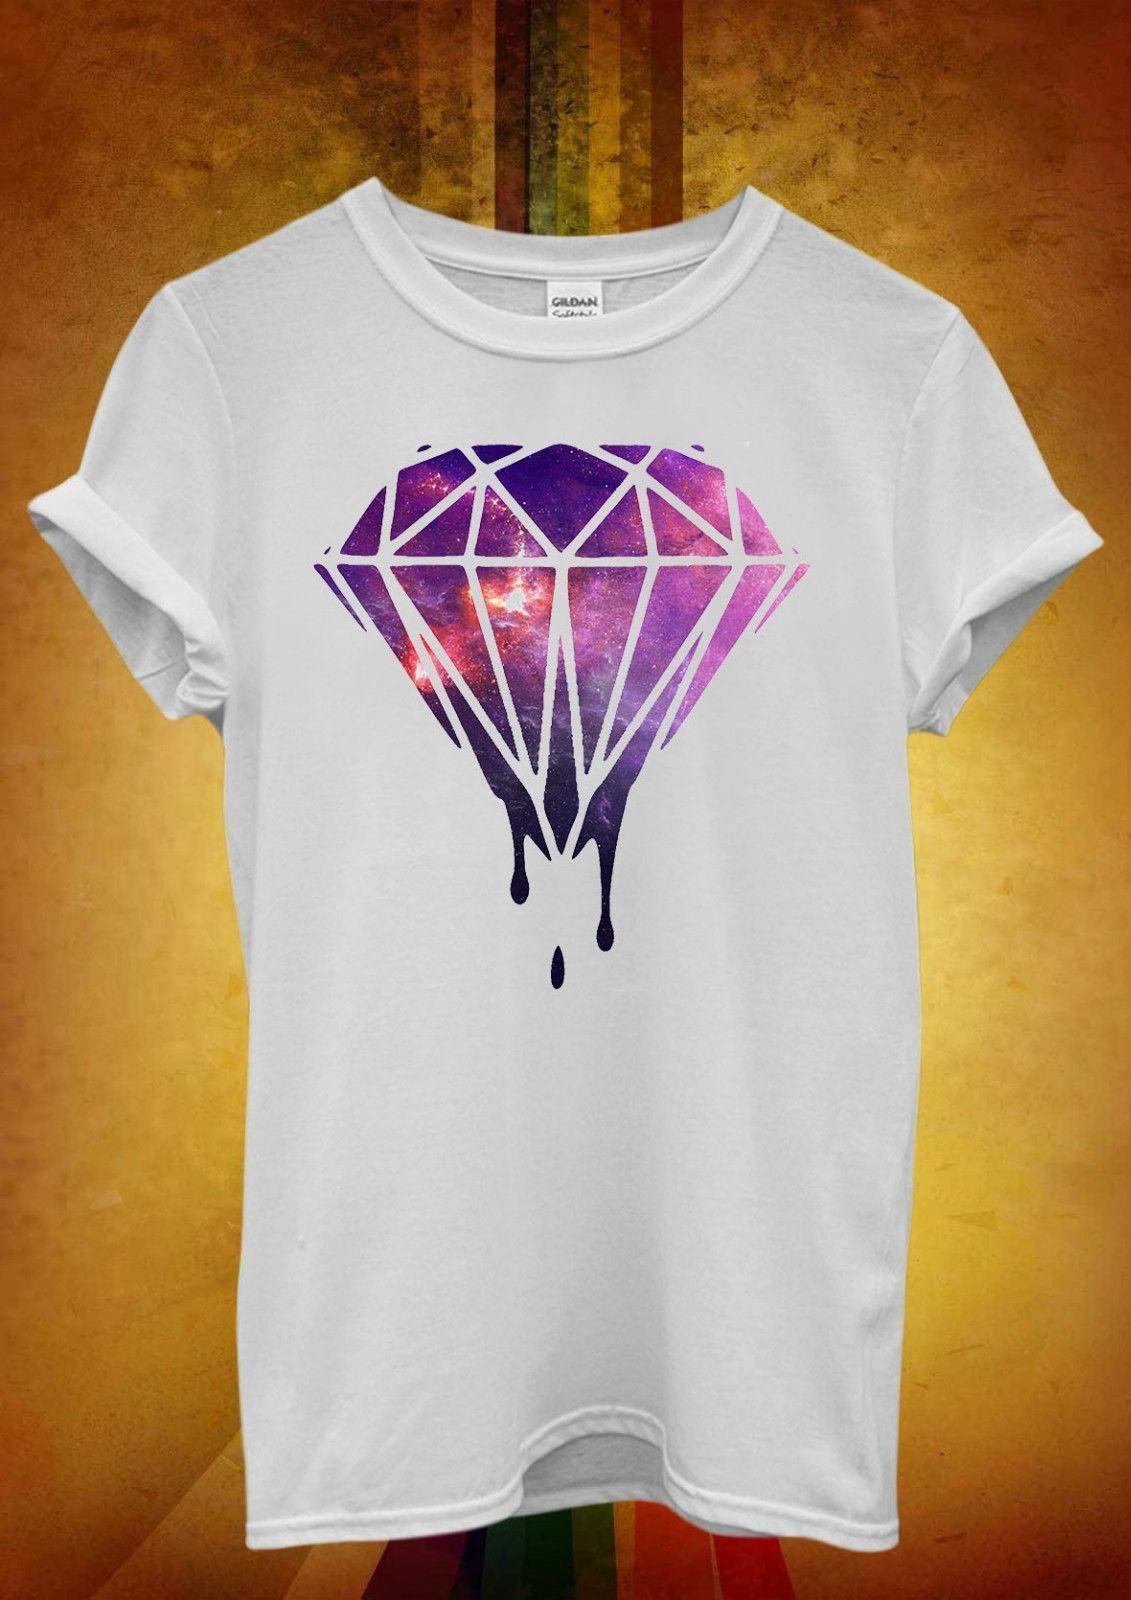 Großhandel Galaxy Diamond Space Hipster Lustige Männer Frauen Unisex T  Shirt Tank Top Weste 538 Von Linnan008,  12.08 Auf De.Dhgate.Com   Dhgate 3189e15c22